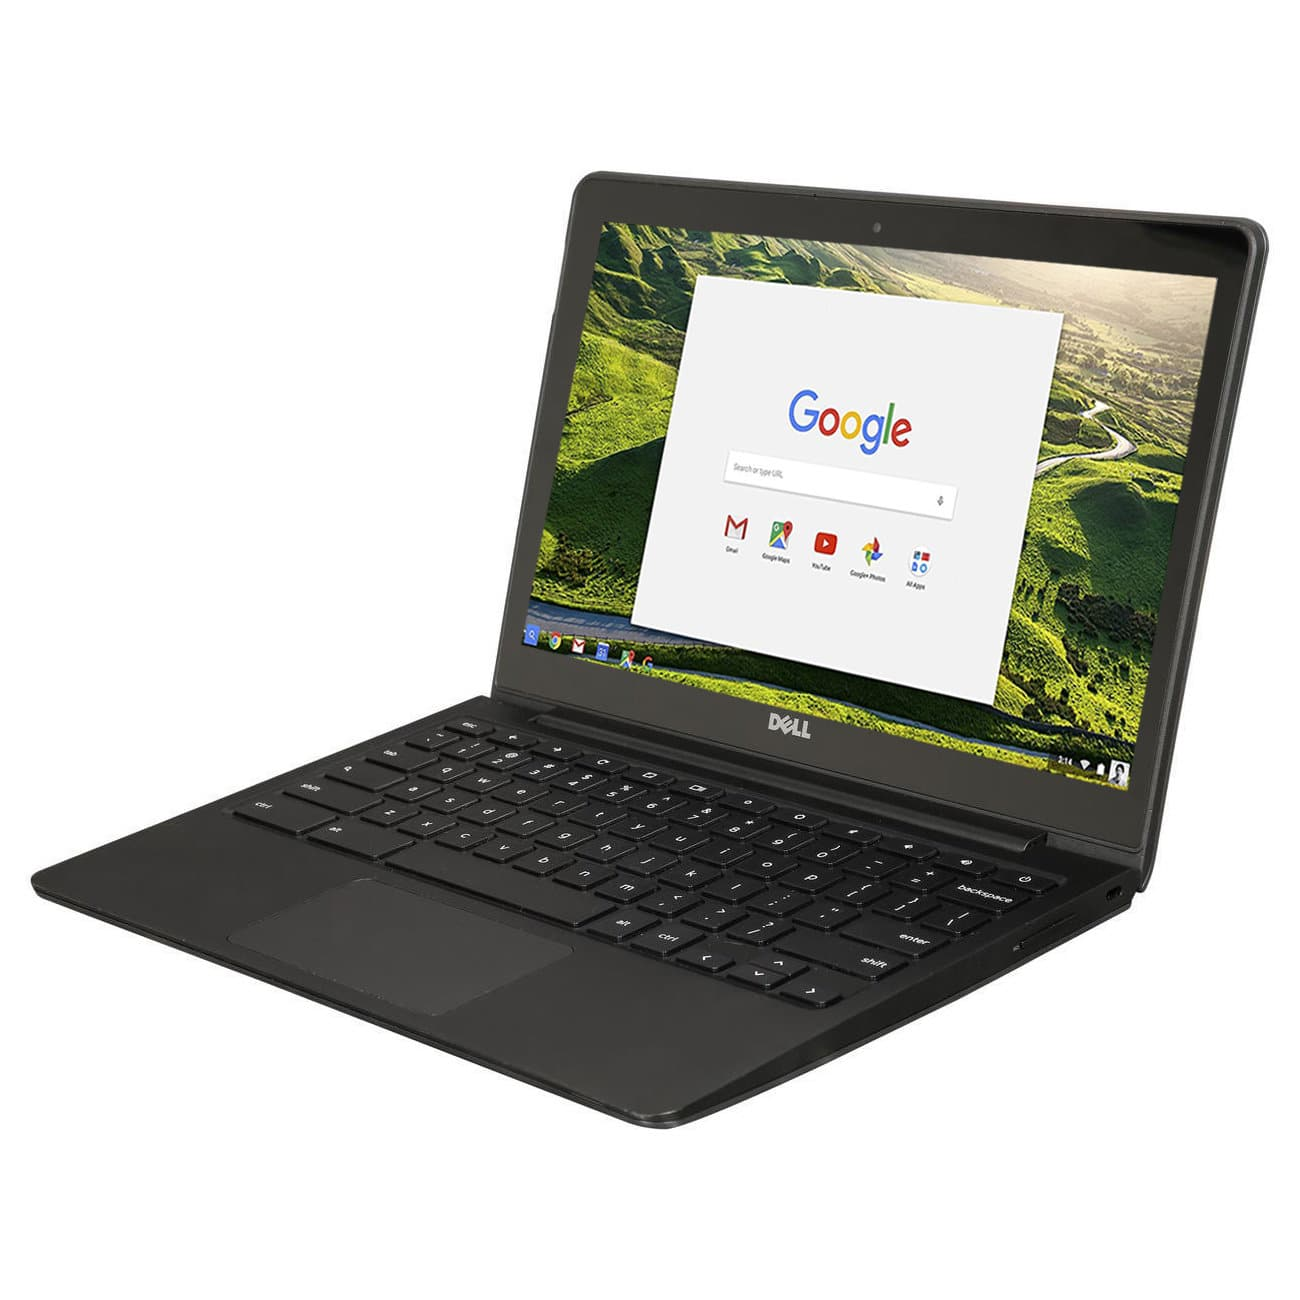 "Dell ChromeBook 11 11.6"" 16GB SSD 4GB Intel Celeron 2955U HDMI, Webcam and WiFi (refurbished) for $110.45 AC Shipped"